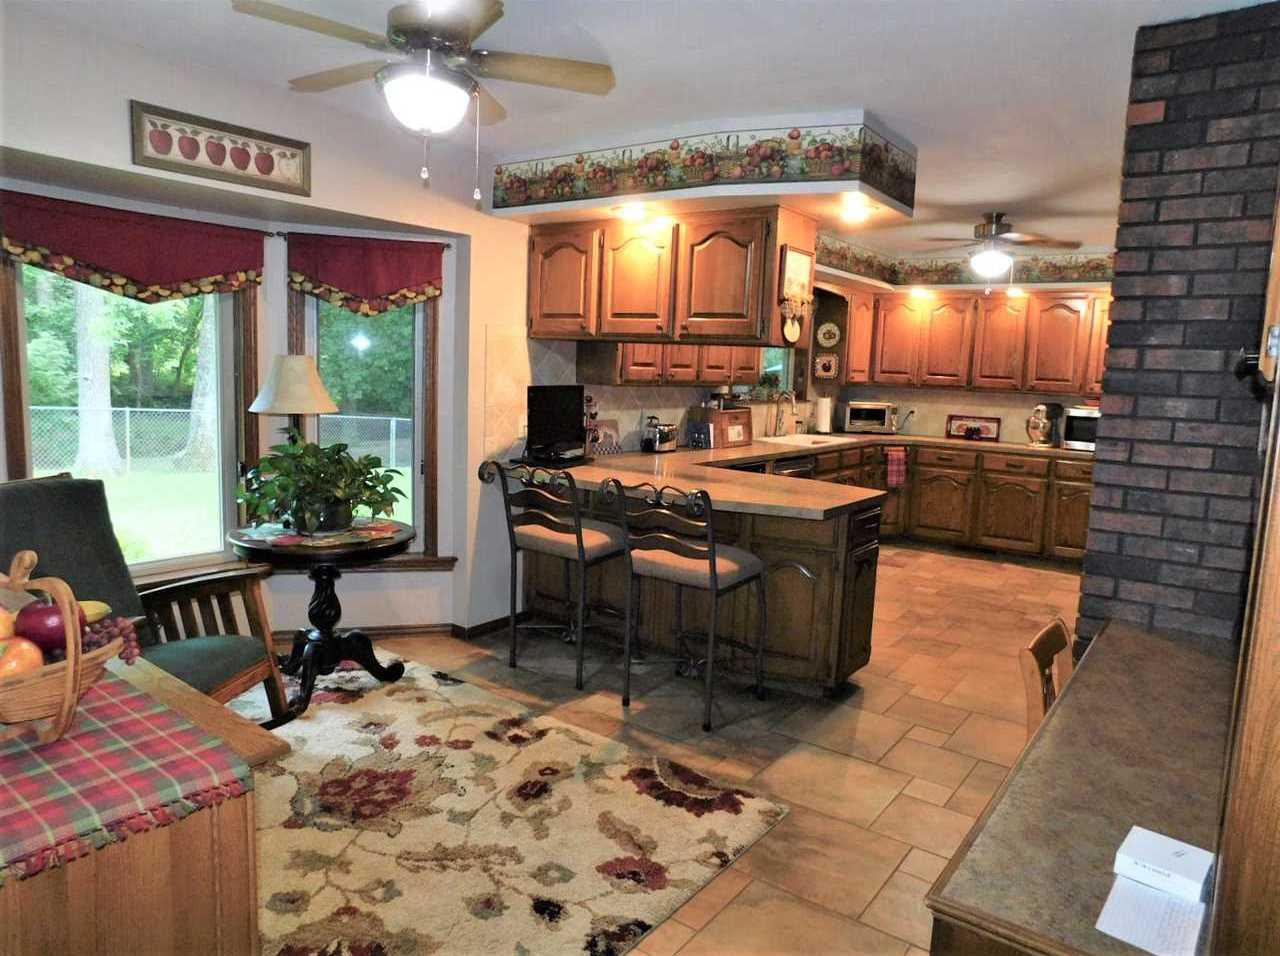 Sold Intraoffice W/MLS | 279 Braden School Rd.  Ponca City, OK 74604 6